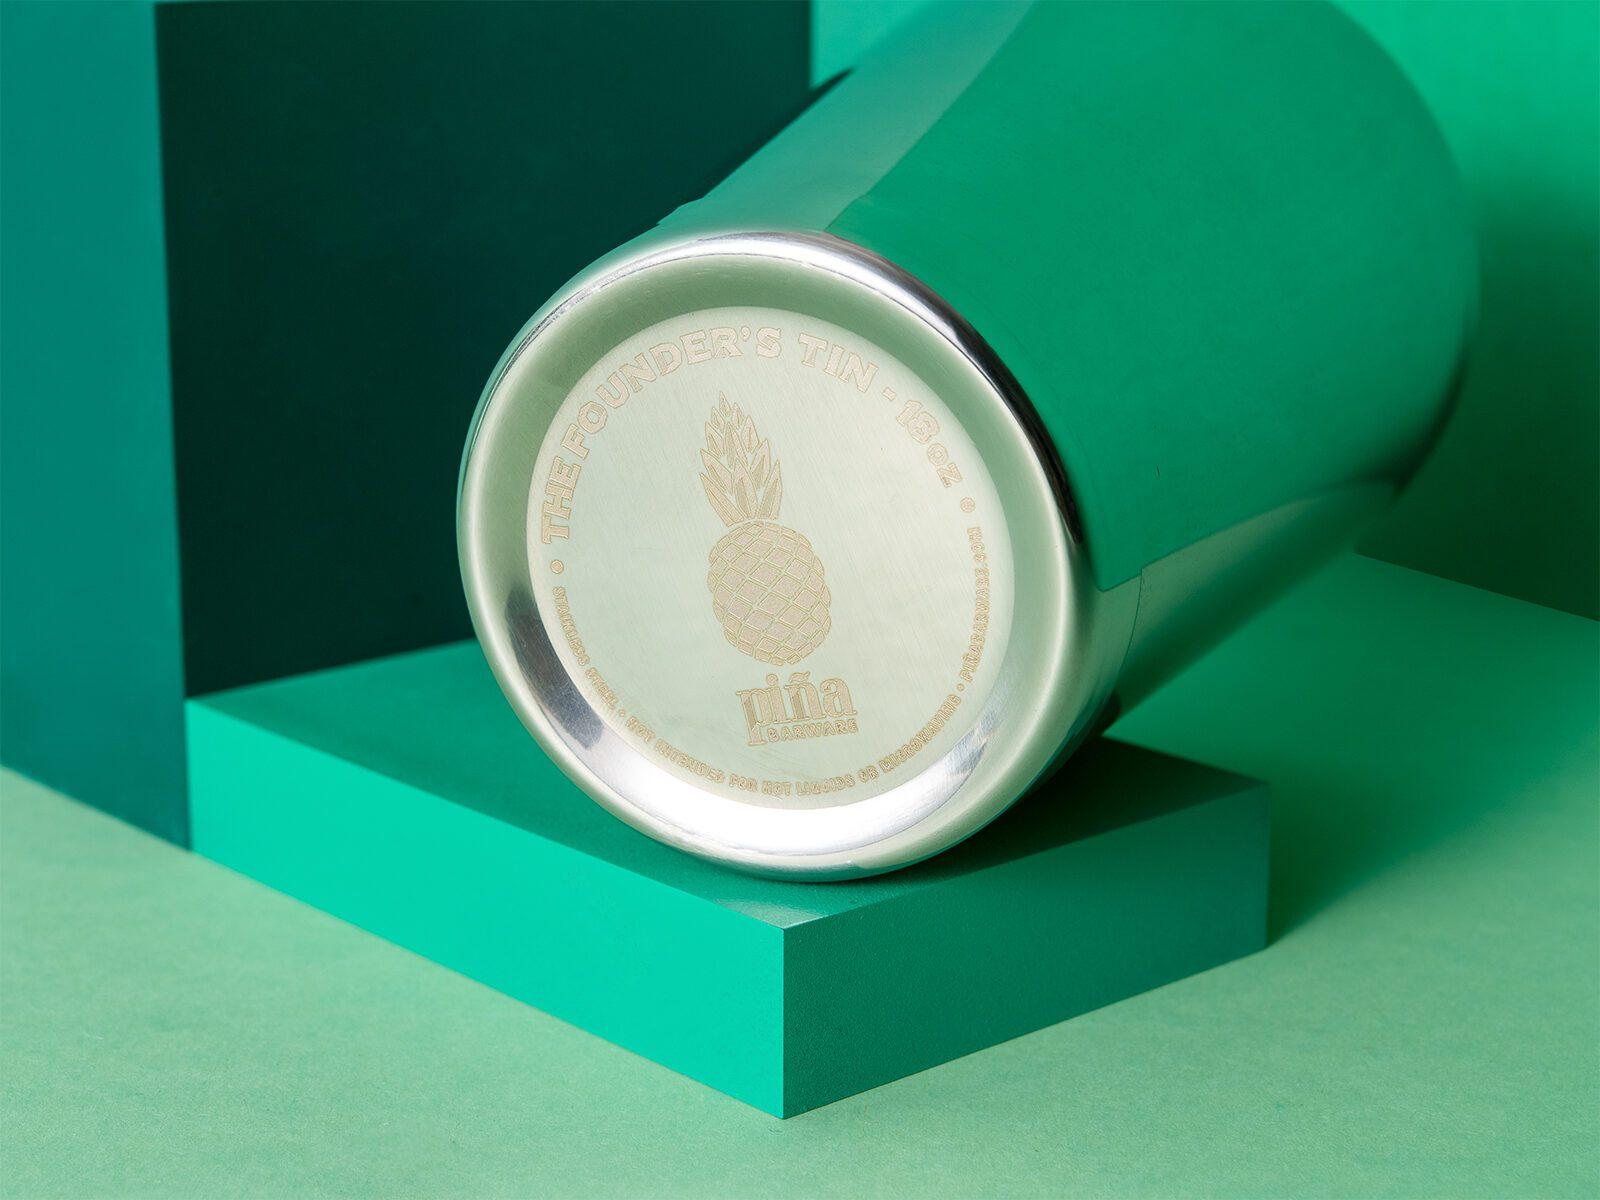 Cocktail Shaker von Pina Barware - Tin in Tin - Drink Syndikat Collection